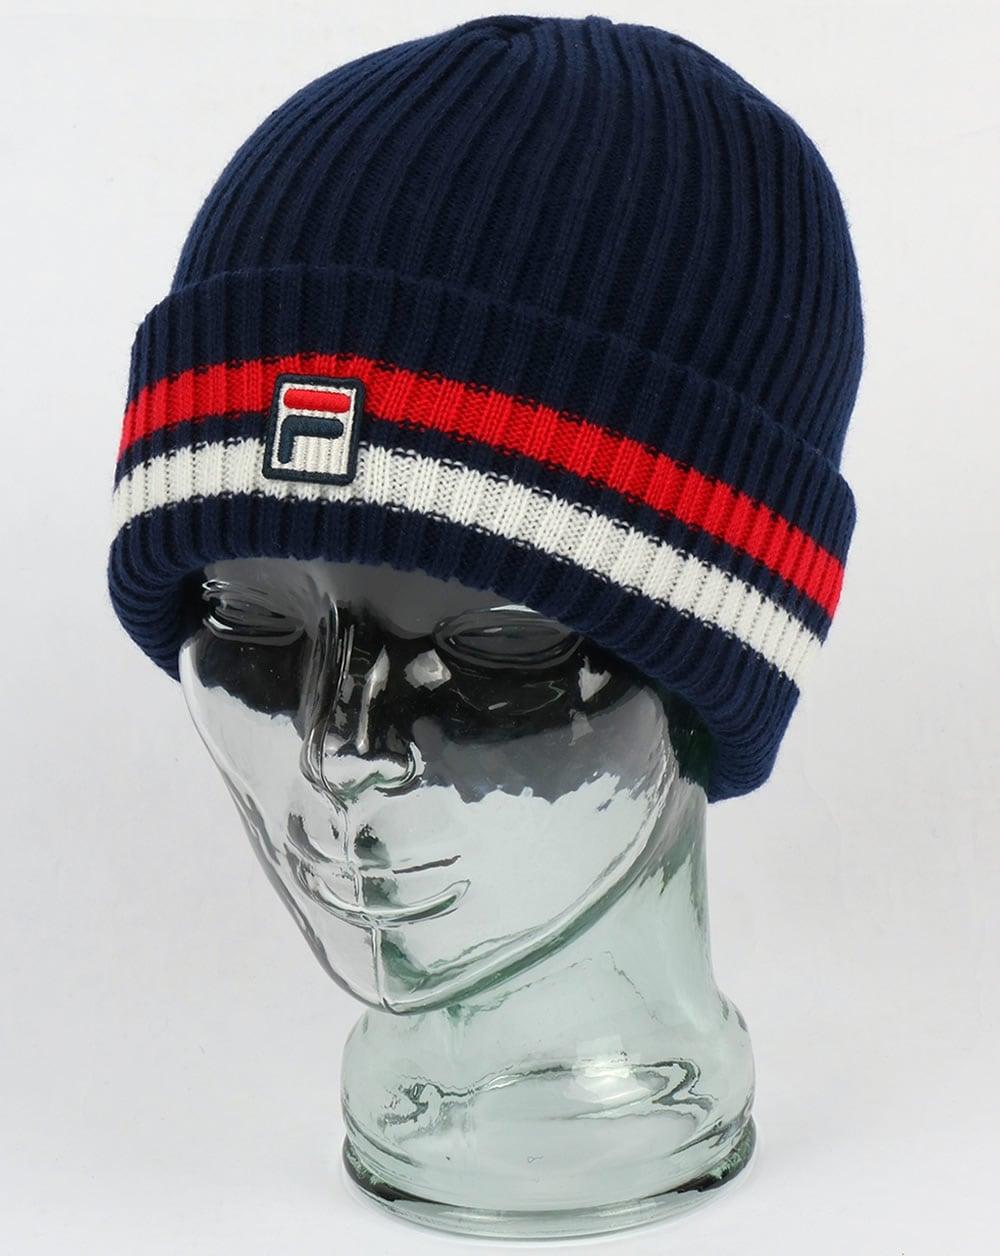 d8848d40e7f Fila Vintage Snow Time Beanie Navy red white - fila vintage beanie hat